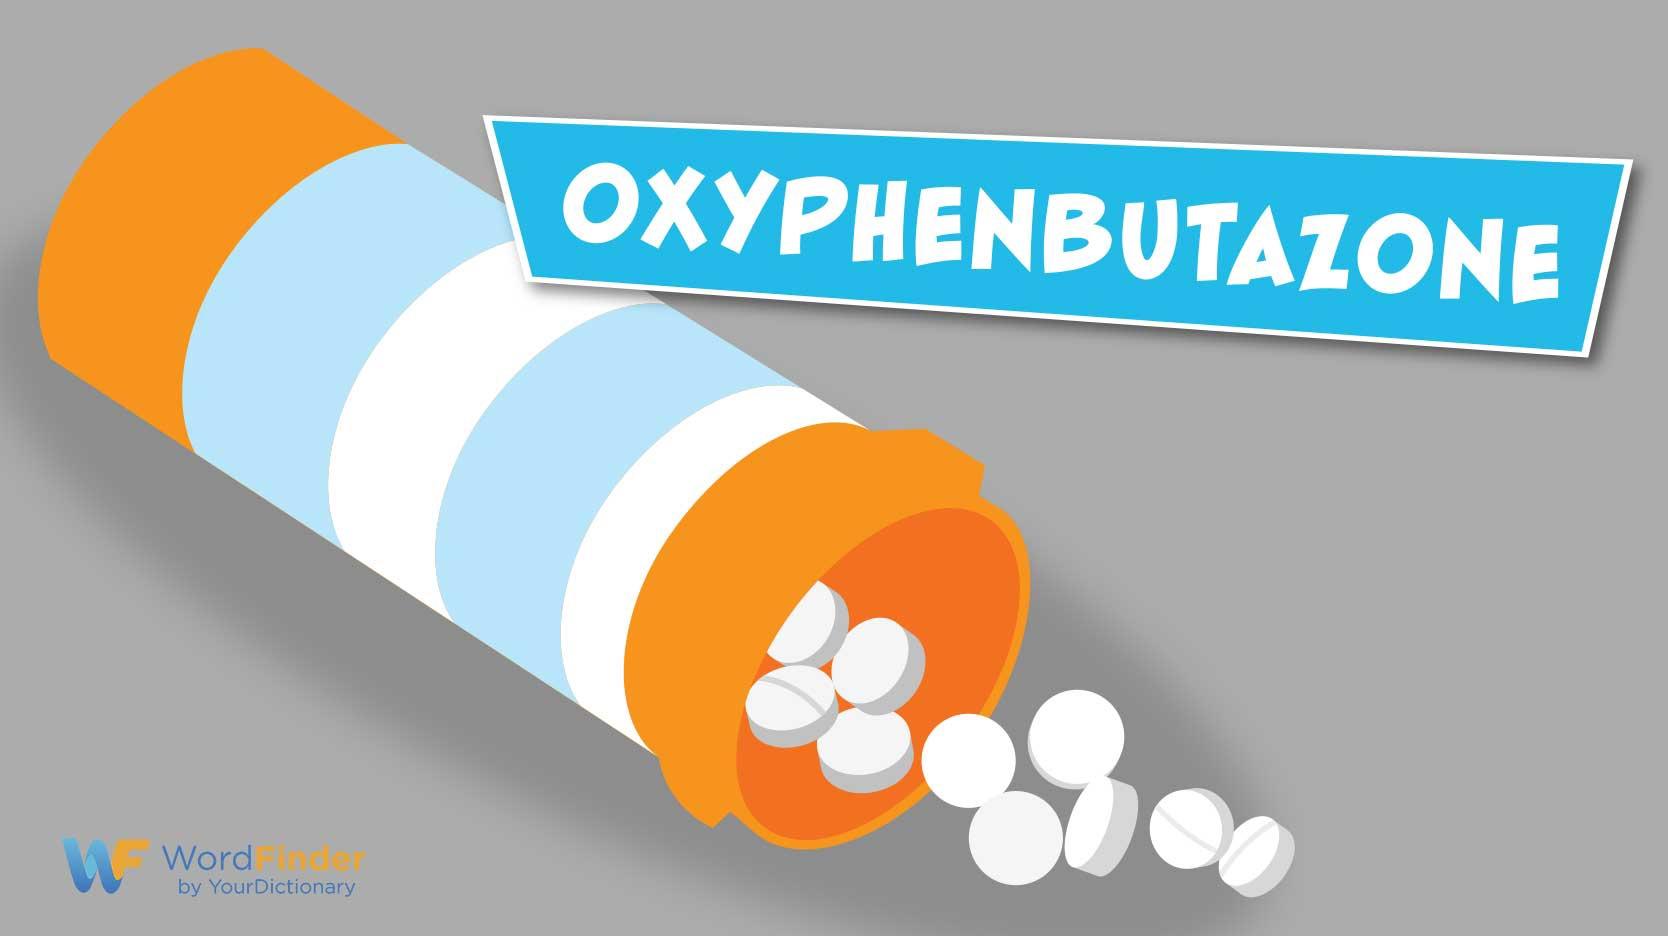 oxyphenbutazone bottle pills